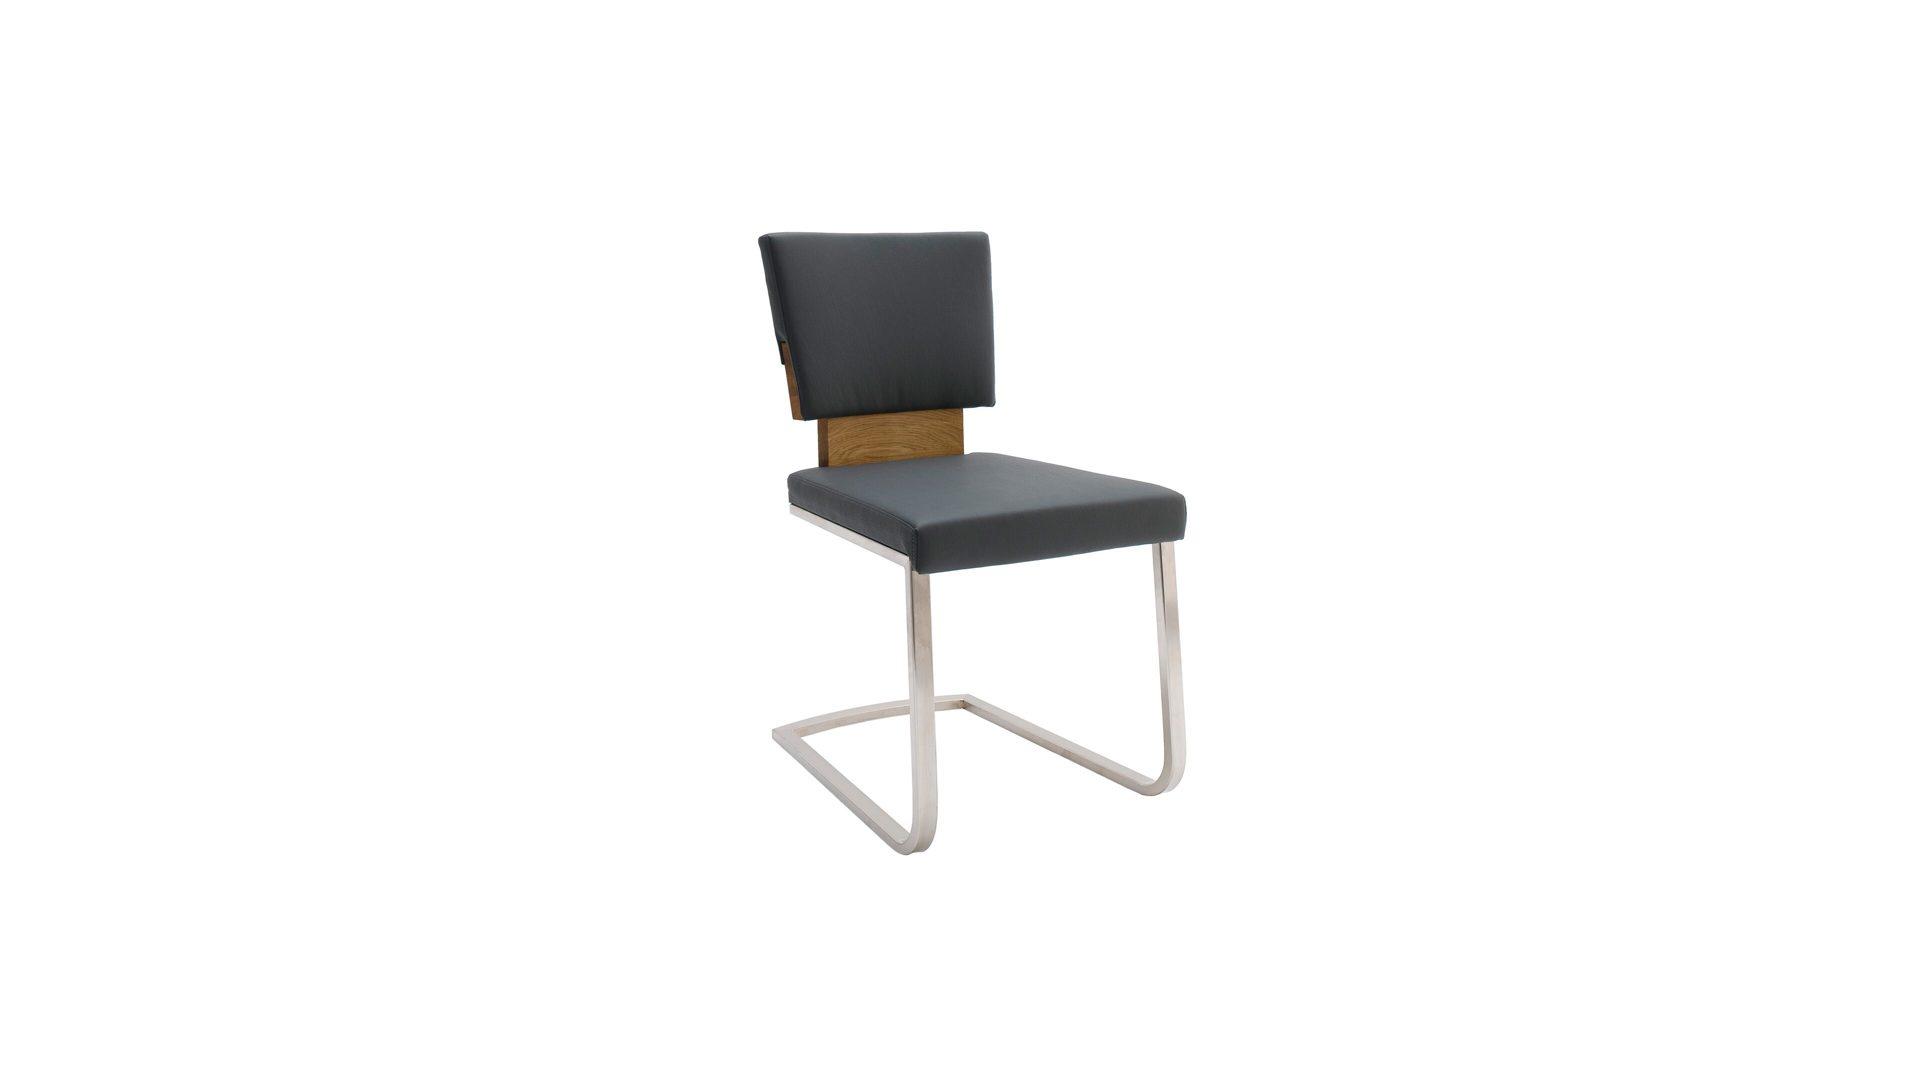 Möbel Eilers Apen Räume Küche Stühle Bänke Schwingstuhl